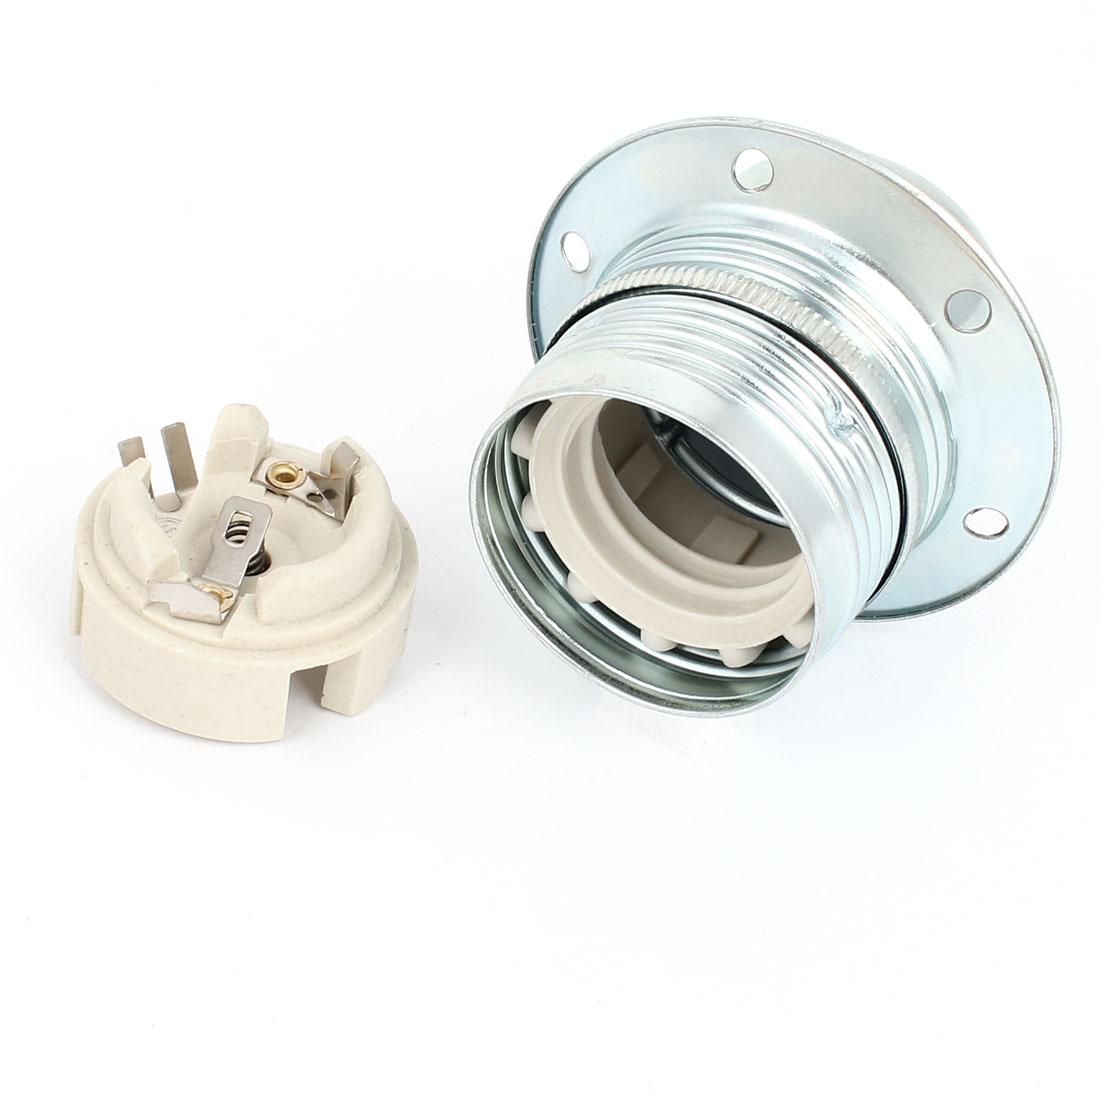 Silver Tone Metal E27 Home DIY Droplight Bulb Base Holder AC 250V 4A